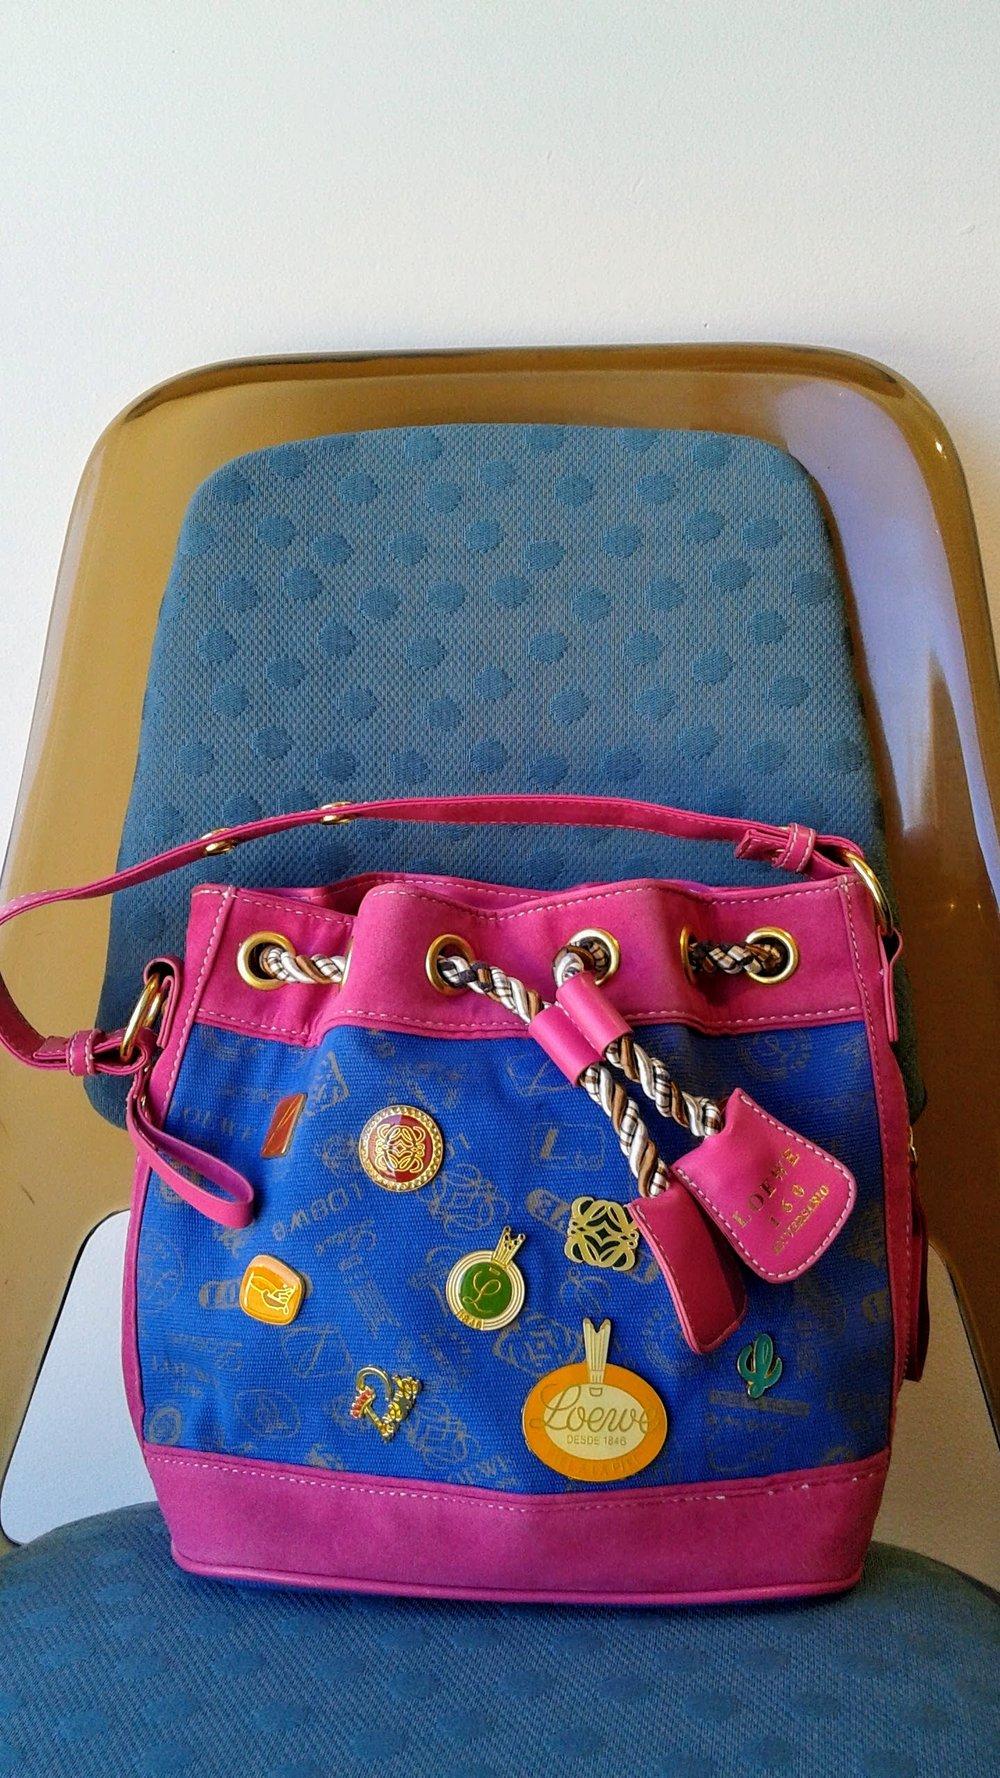 Loewe purse, $42